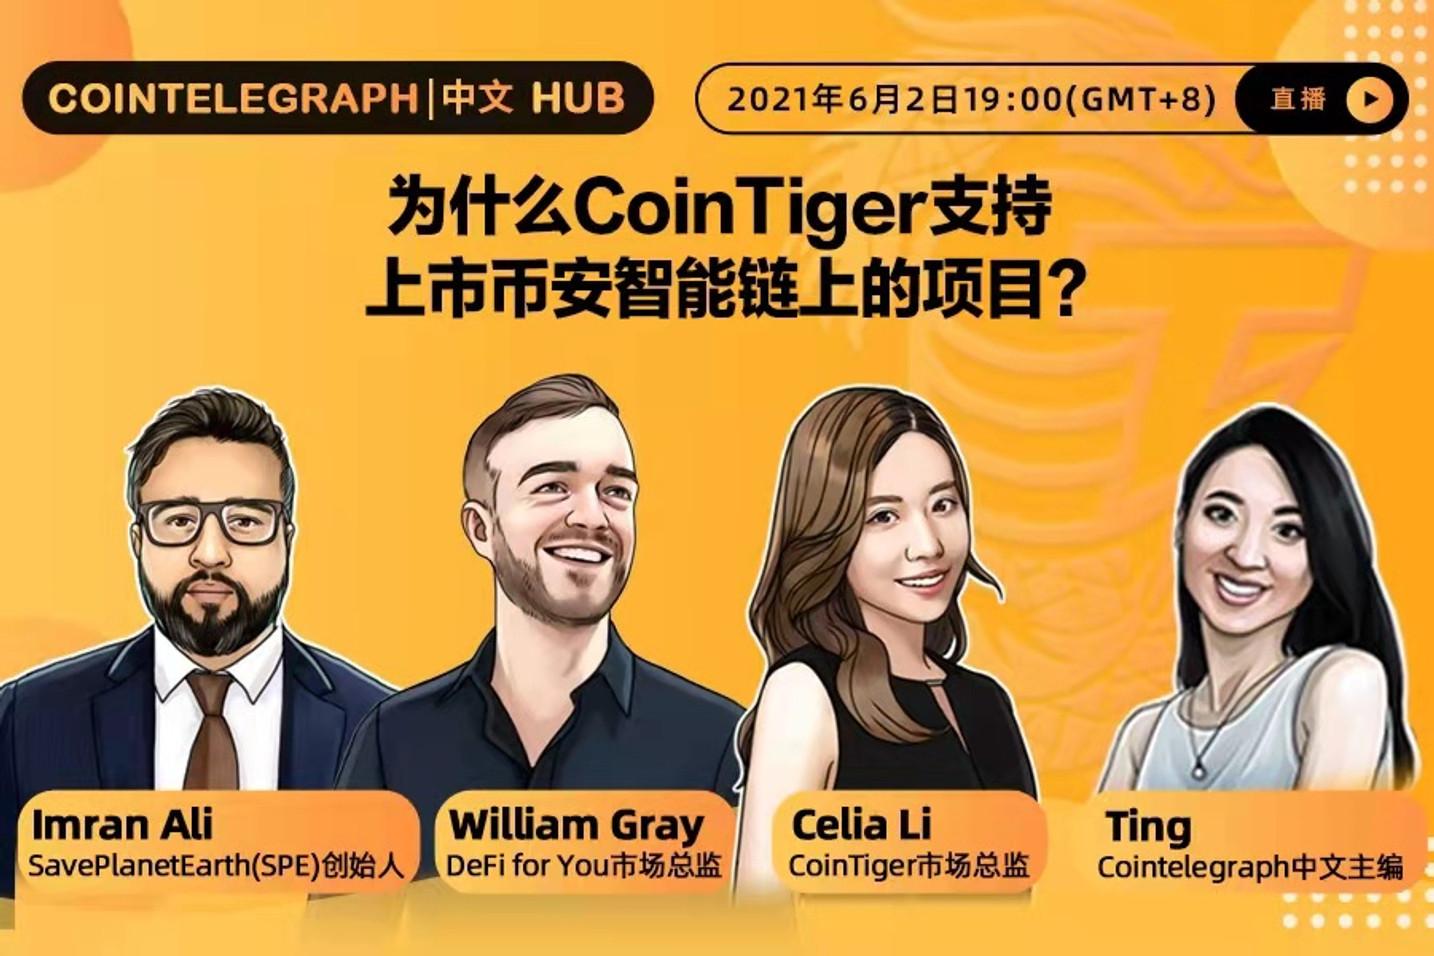 Cointelegraph中文HUB   为什么CoinTiger支持上市币安智能链上的项目?